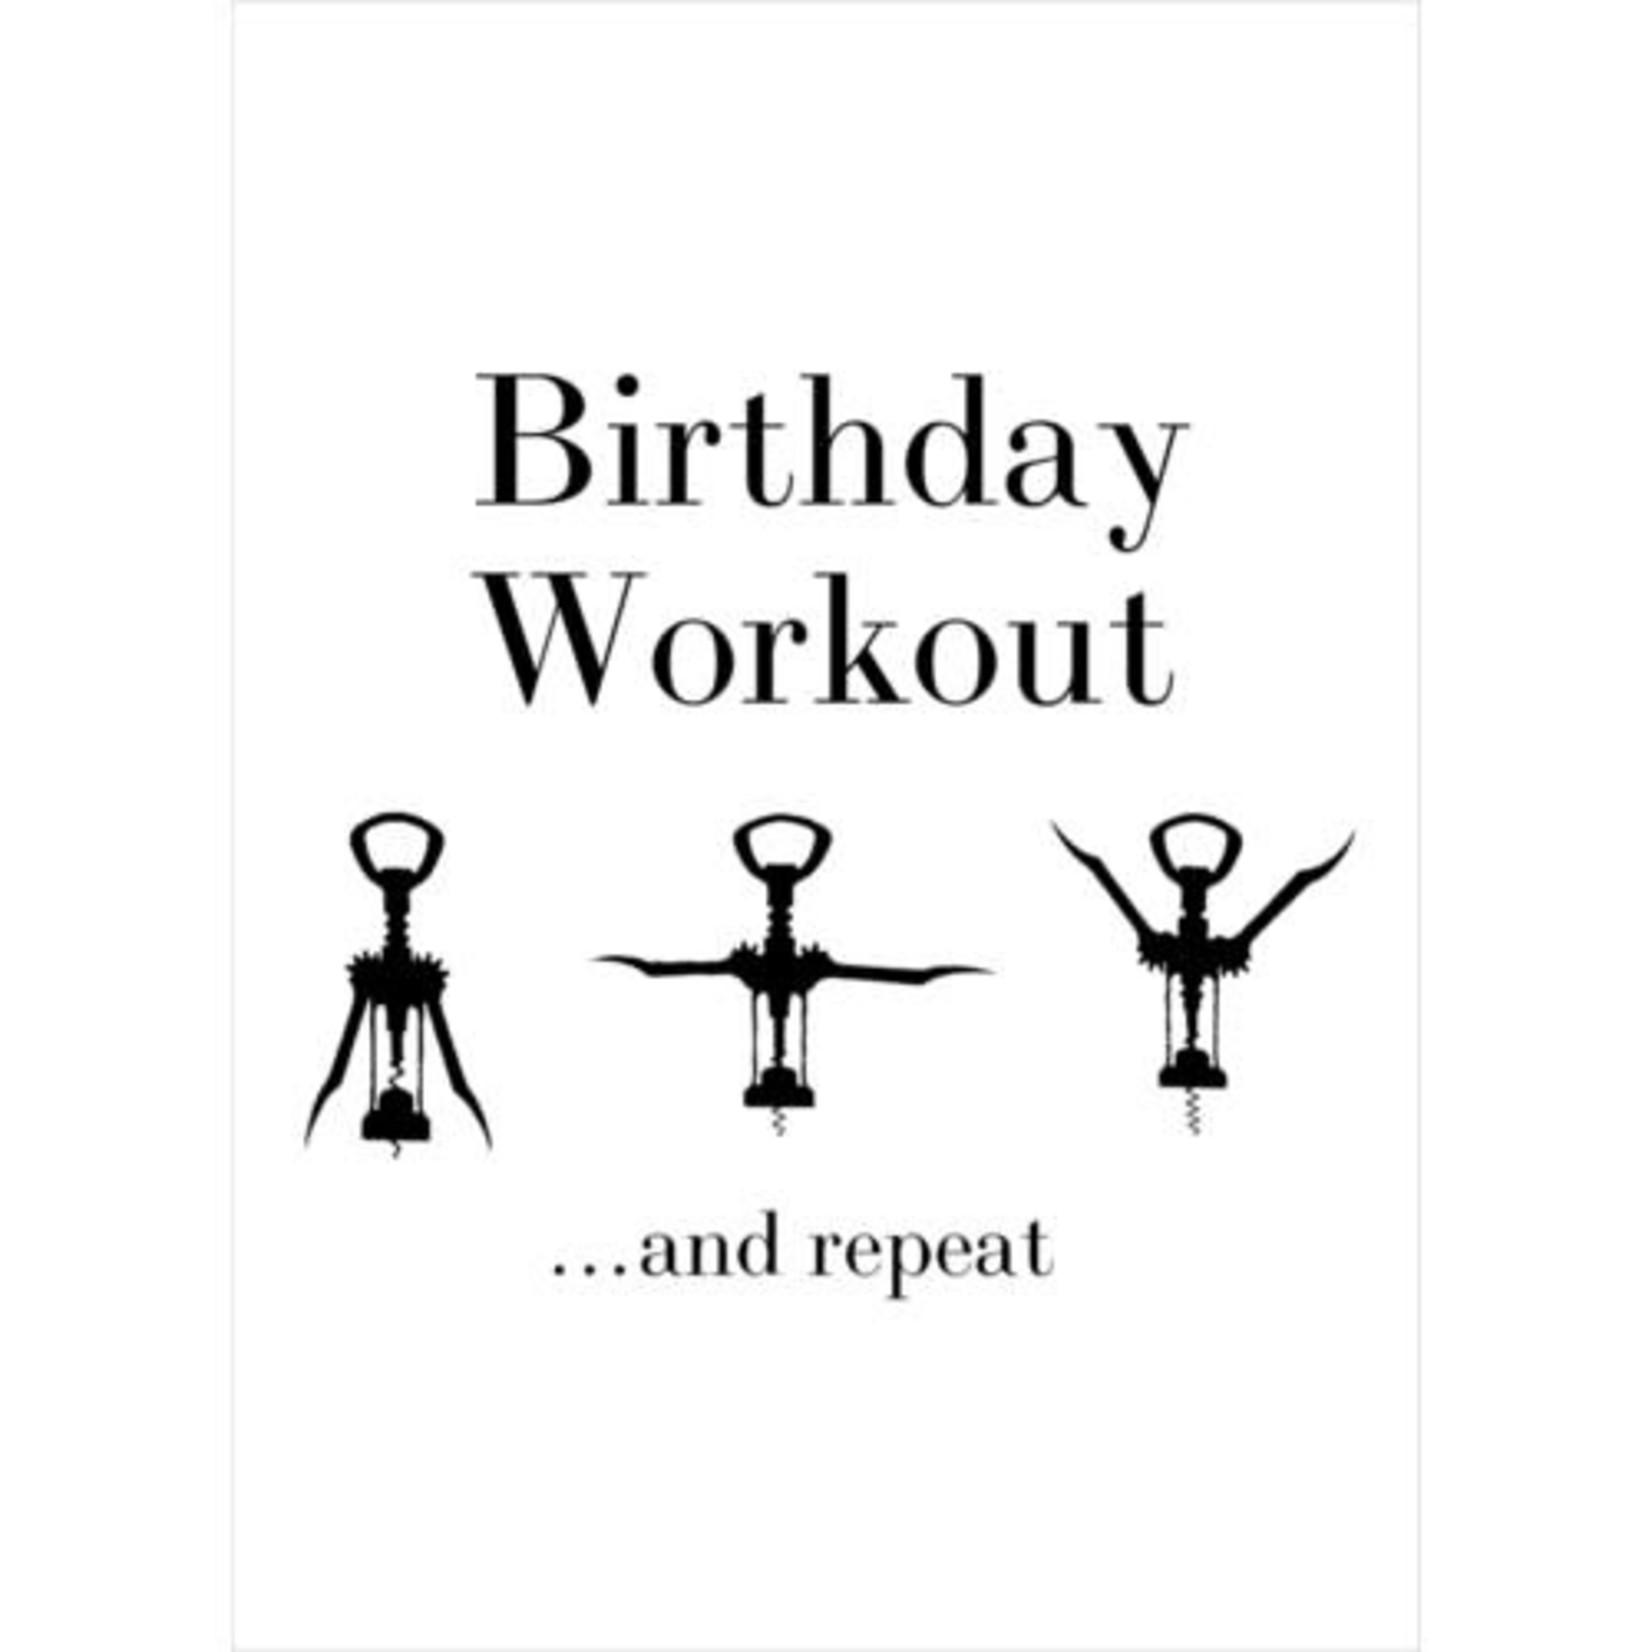 BIRTHDAY WORKOUT CARD